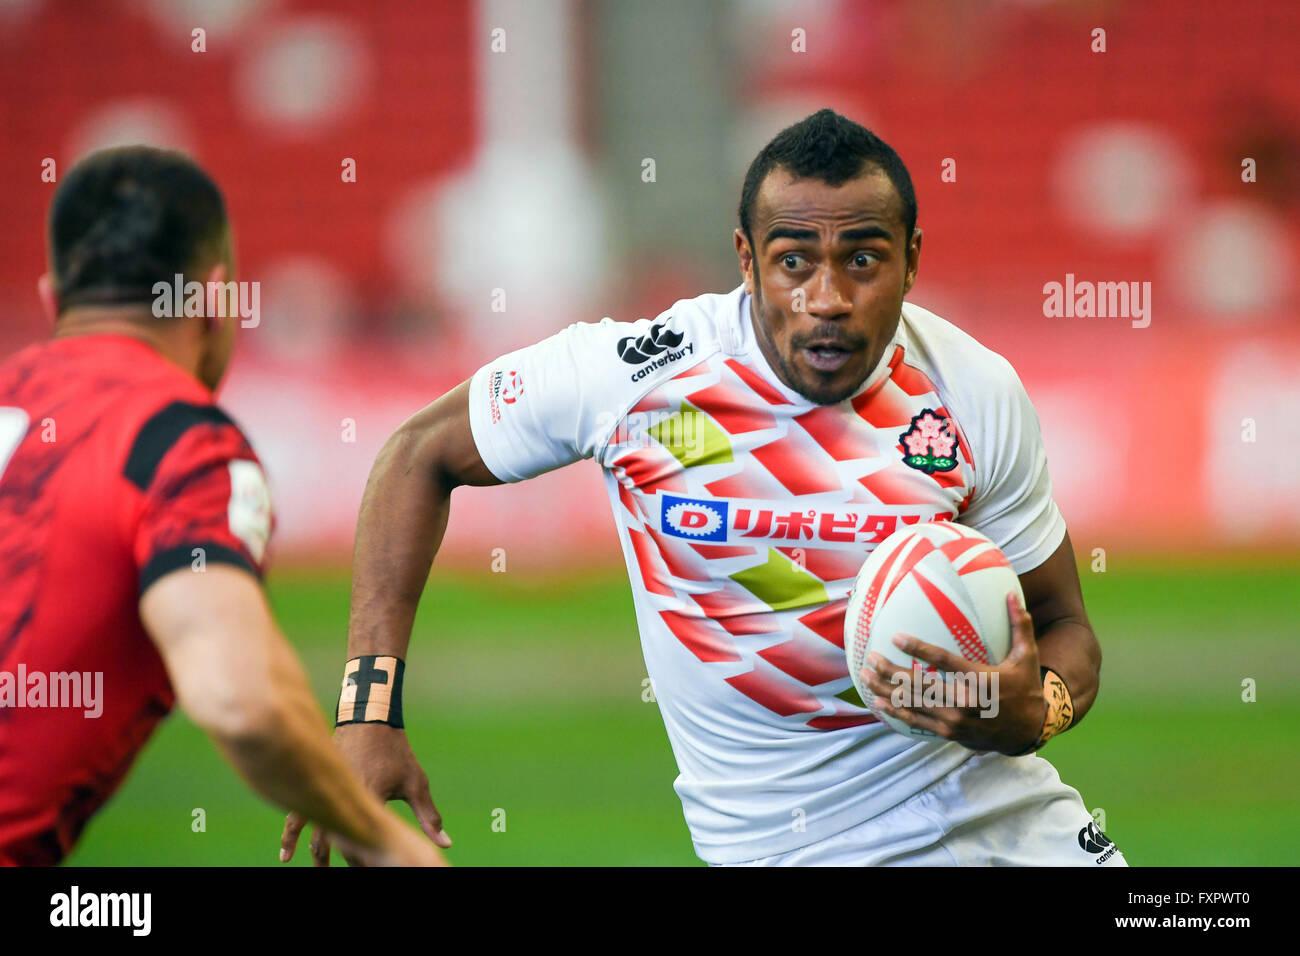 Kameli Soejima (JPN), APRL 16, 2016 - Rugby : HSBC Sevens World Series, Singapore Sevens corrispondono a Giappone Immagini Stock